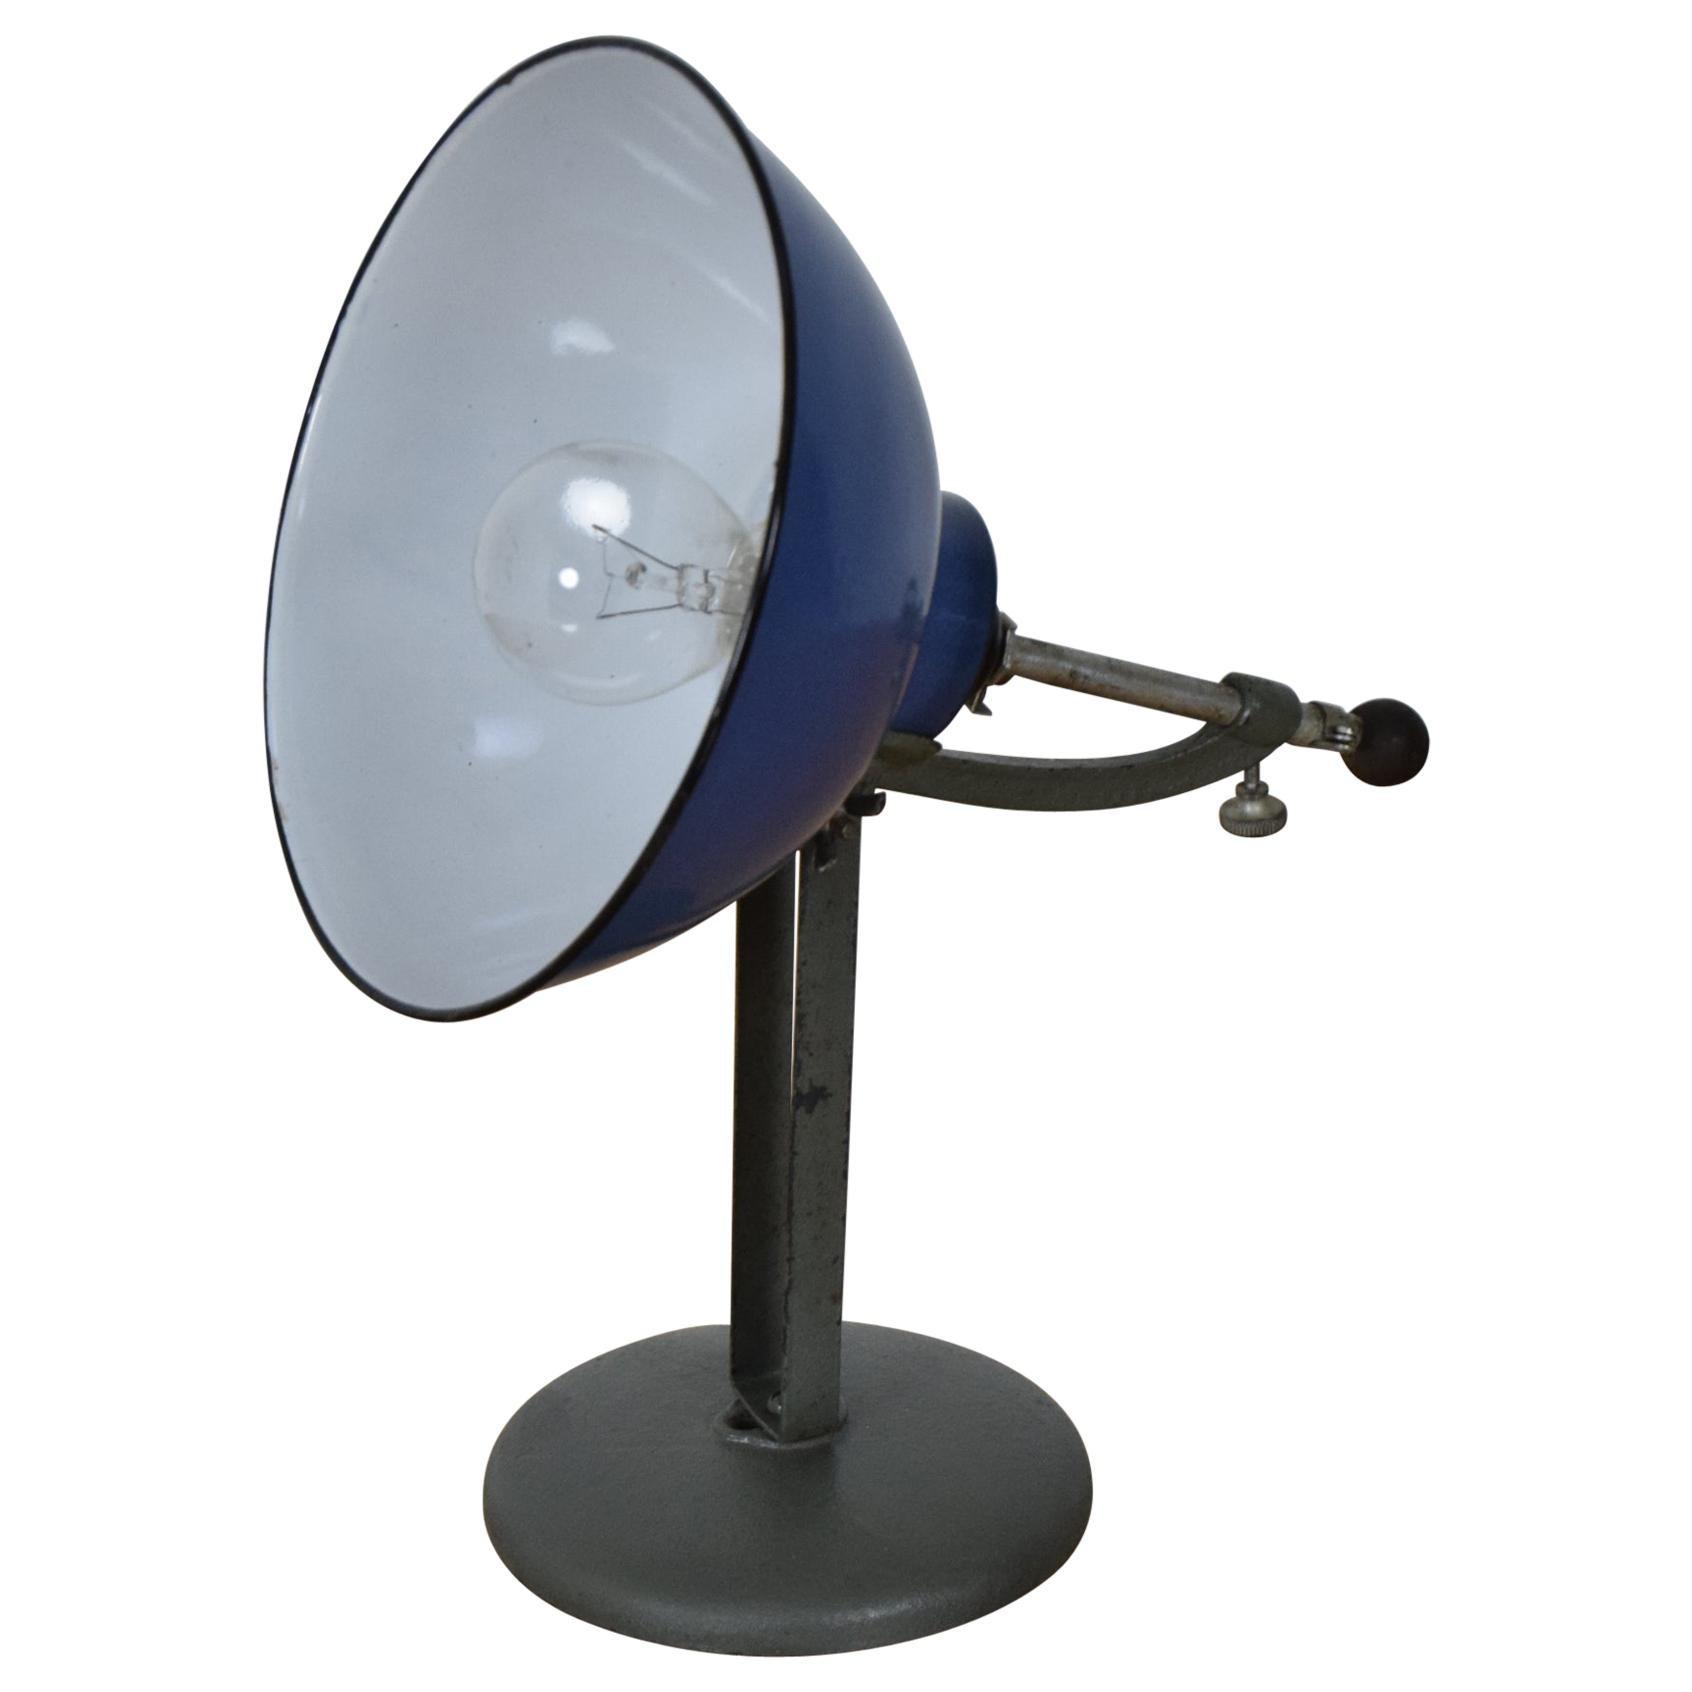 Midcentury Table Lamp, 1970s